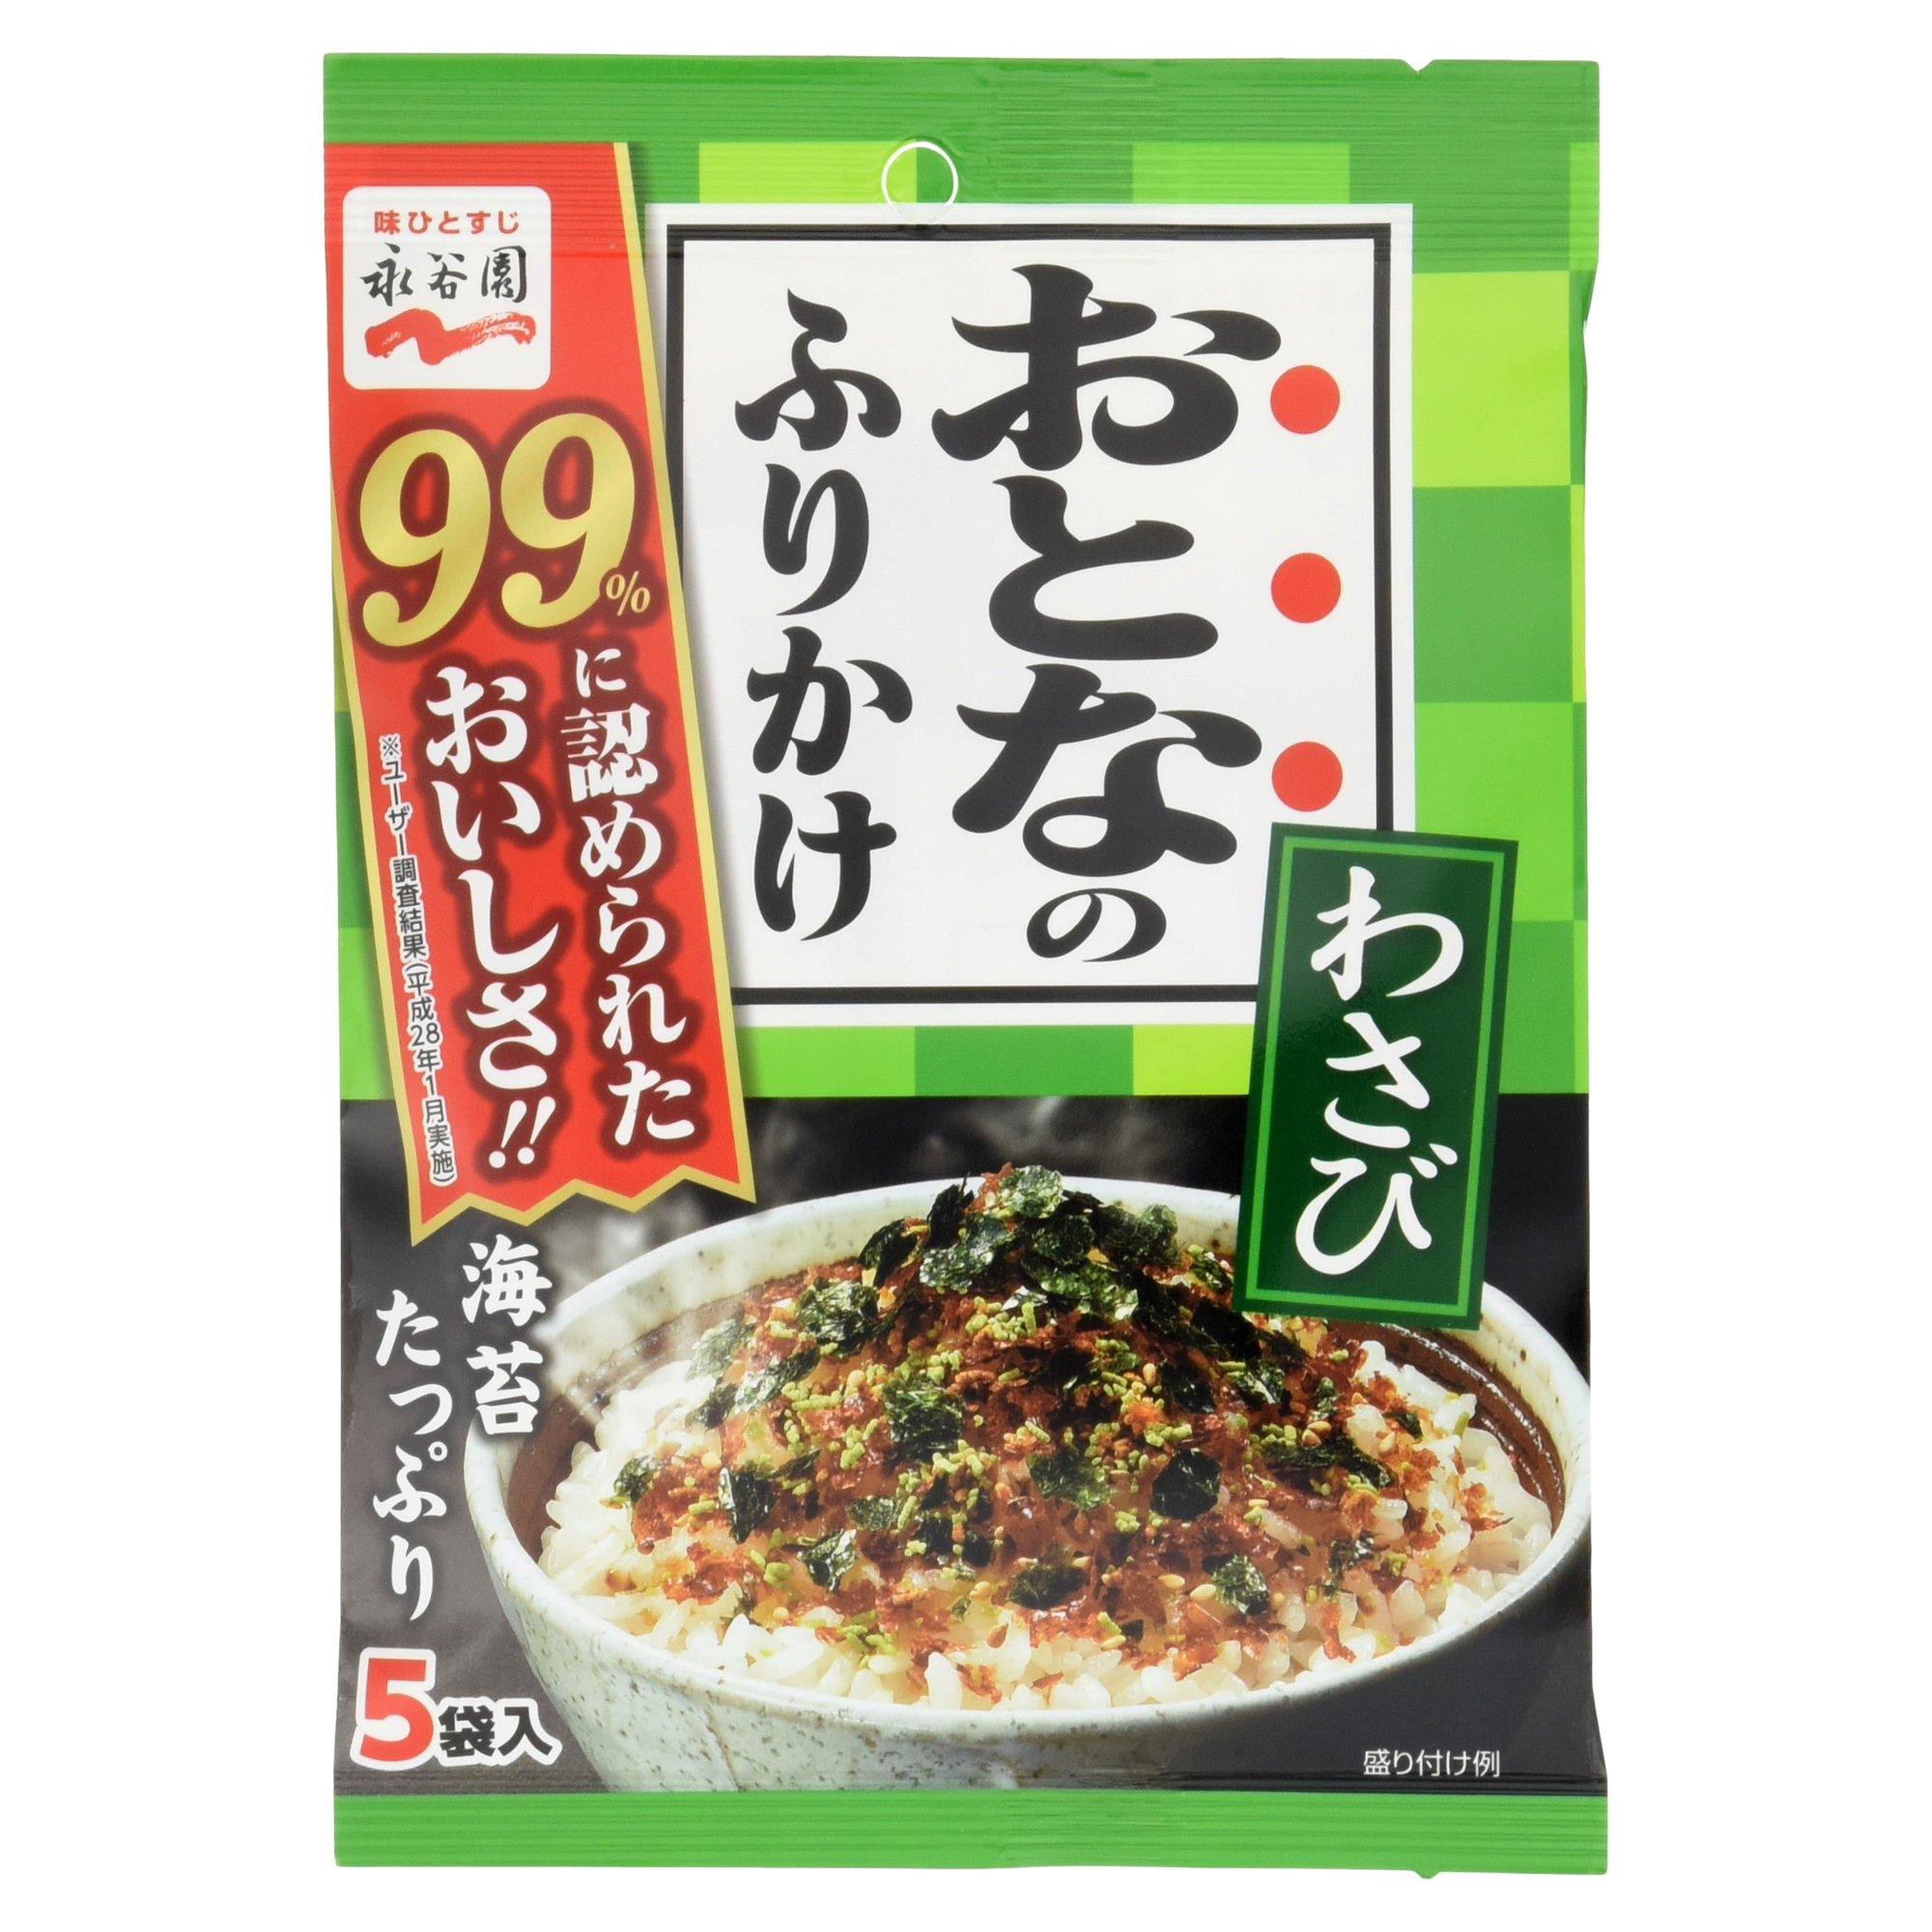 Nagatanien OTONA NO FURIKAKE | Rice Seasoning | Wasabi & Seaweed 13.5g ( 2.7g x 5 Pcs ) [ Japanese Import ]